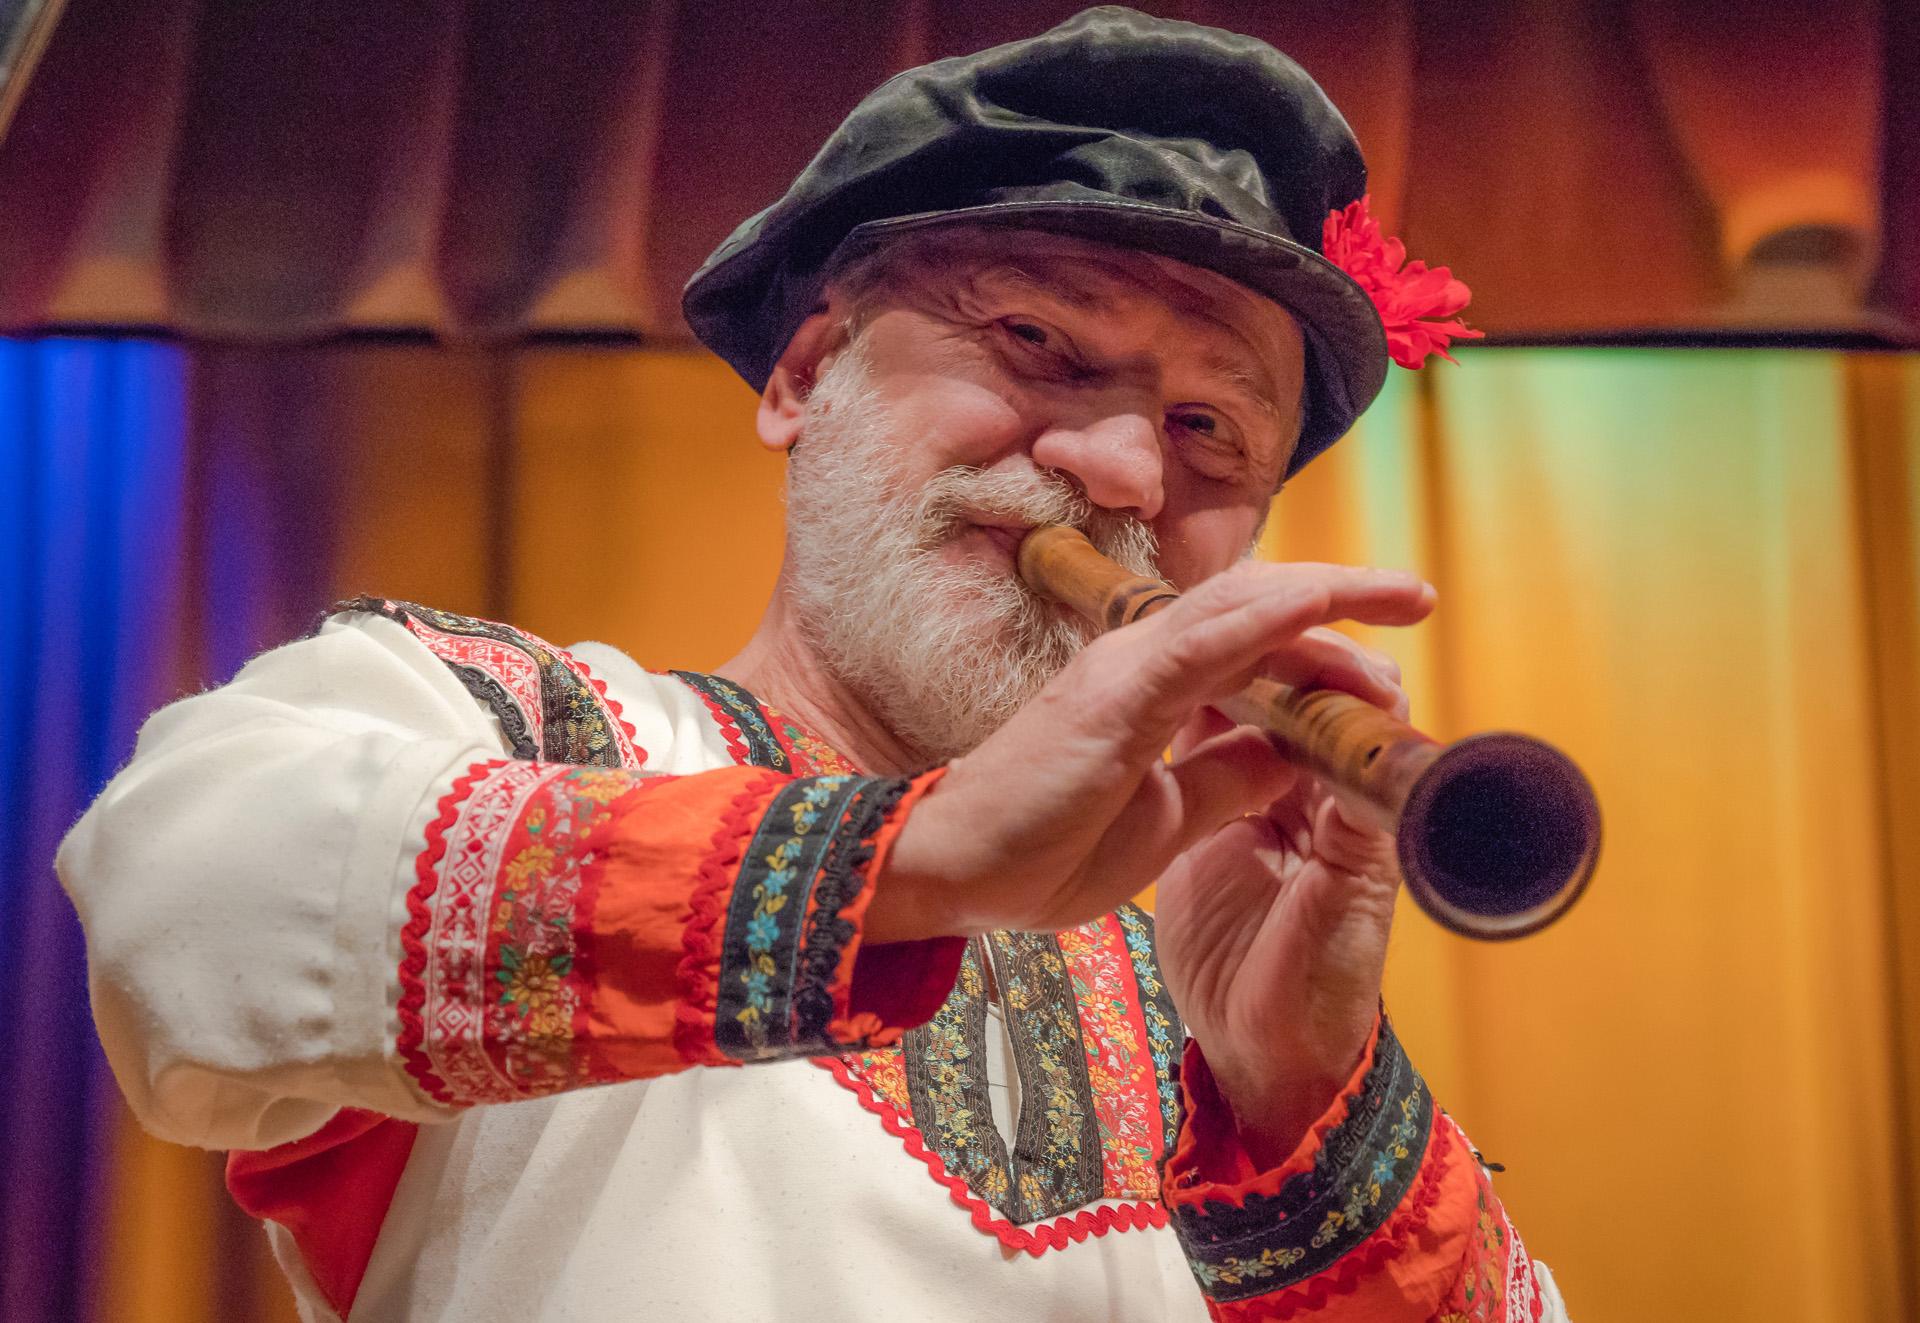 Russian Folk Musician - Color Print(Open) - Bob Muschewske